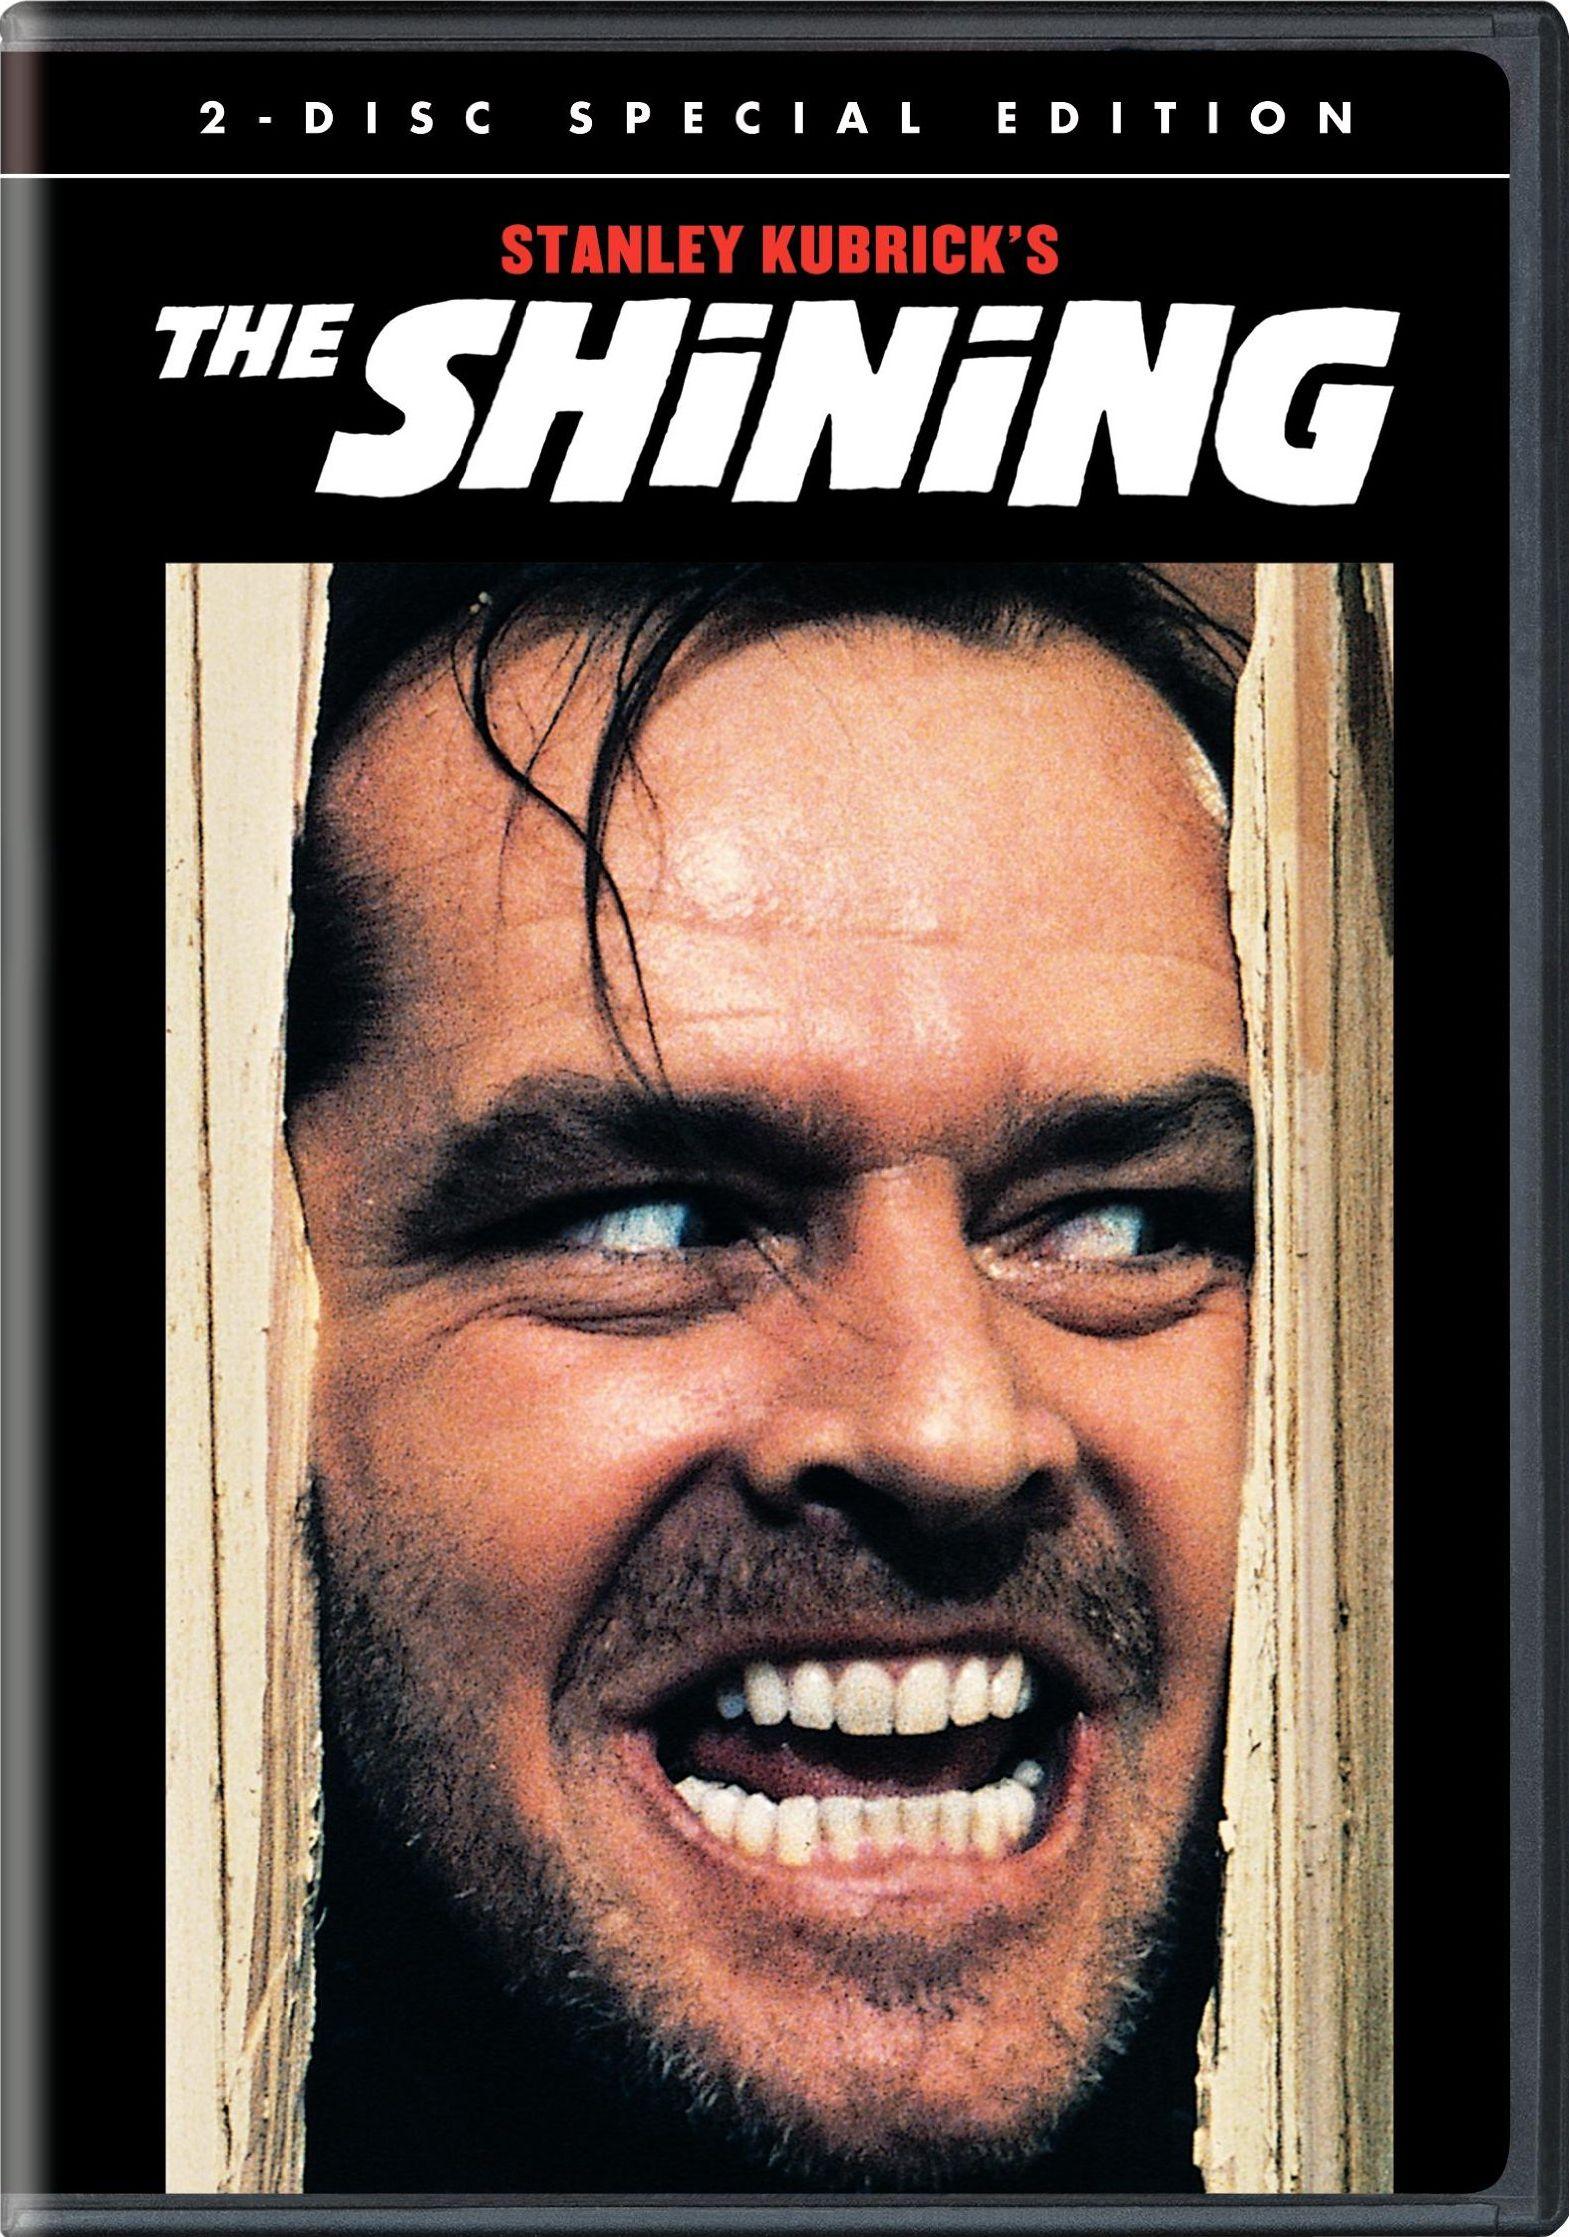 the shining - photo #3